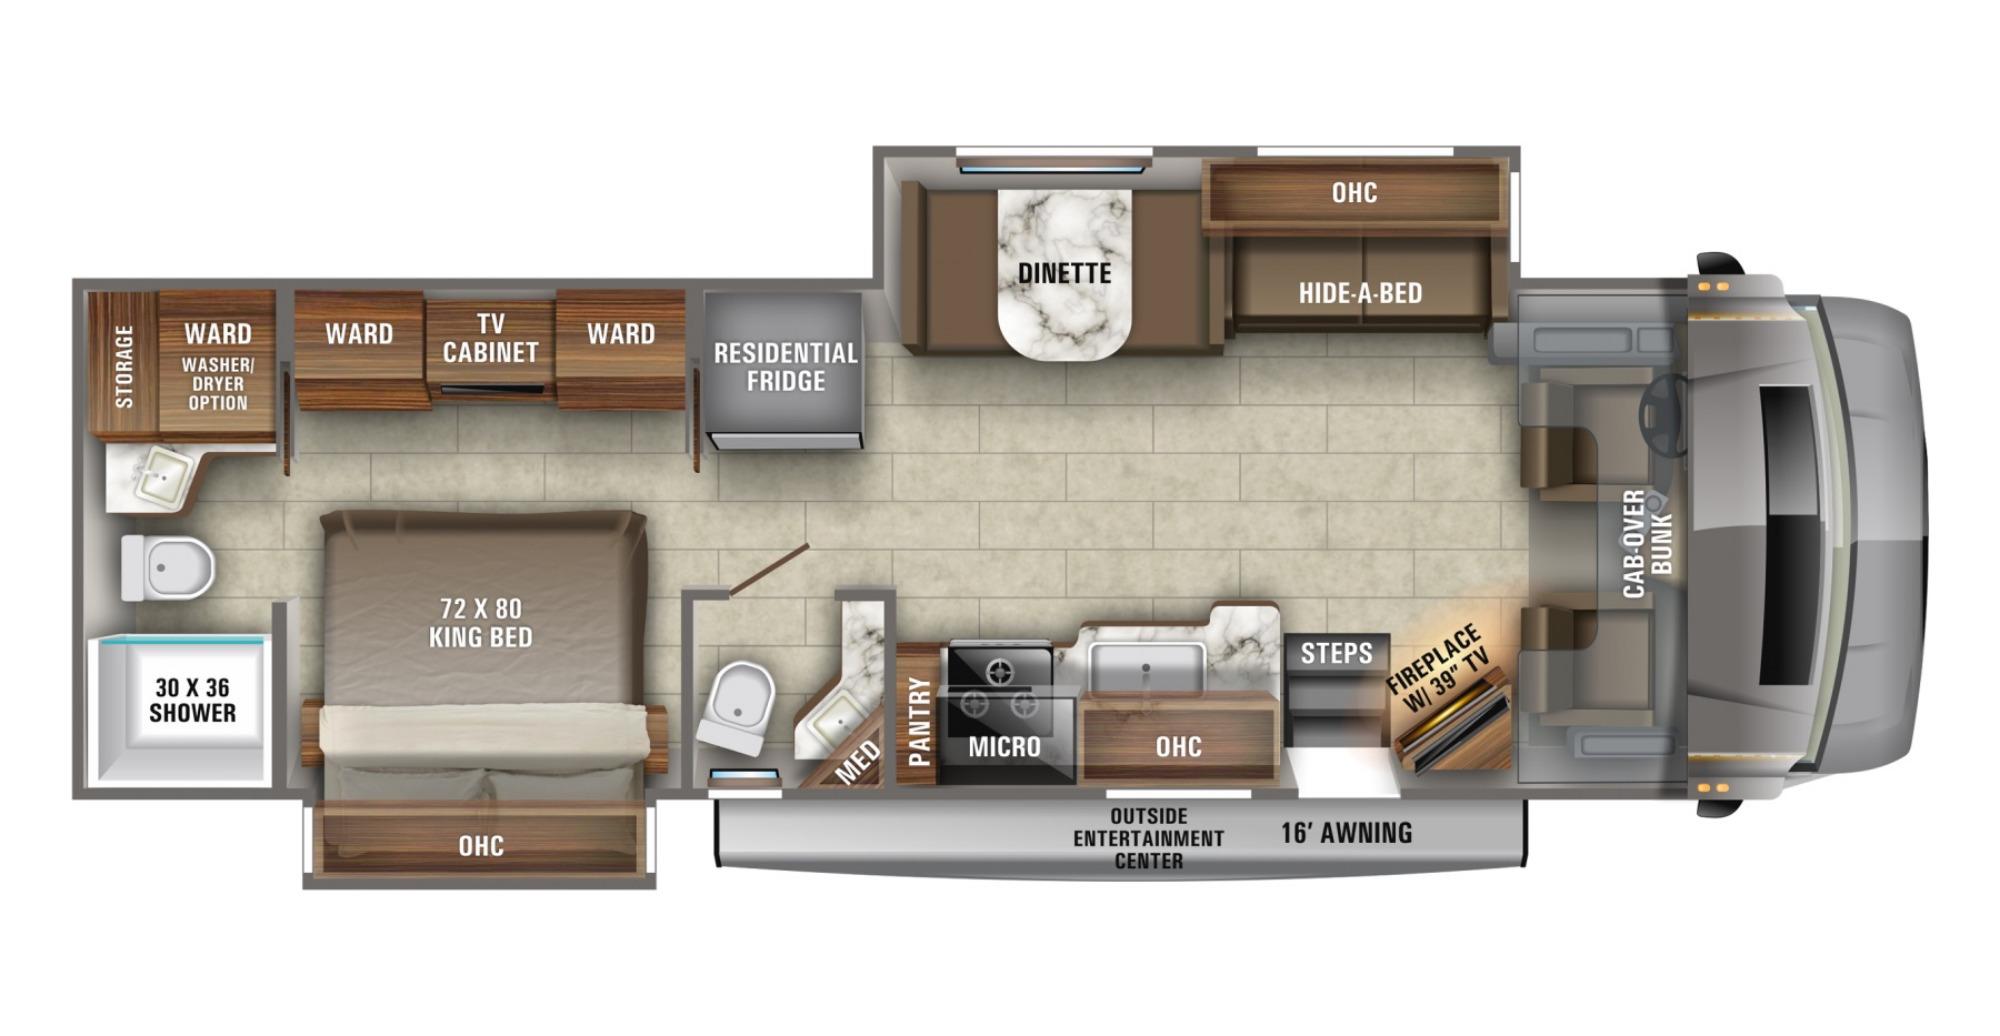 View Floor Plan for 2021 JAYCO SENECA 37RB